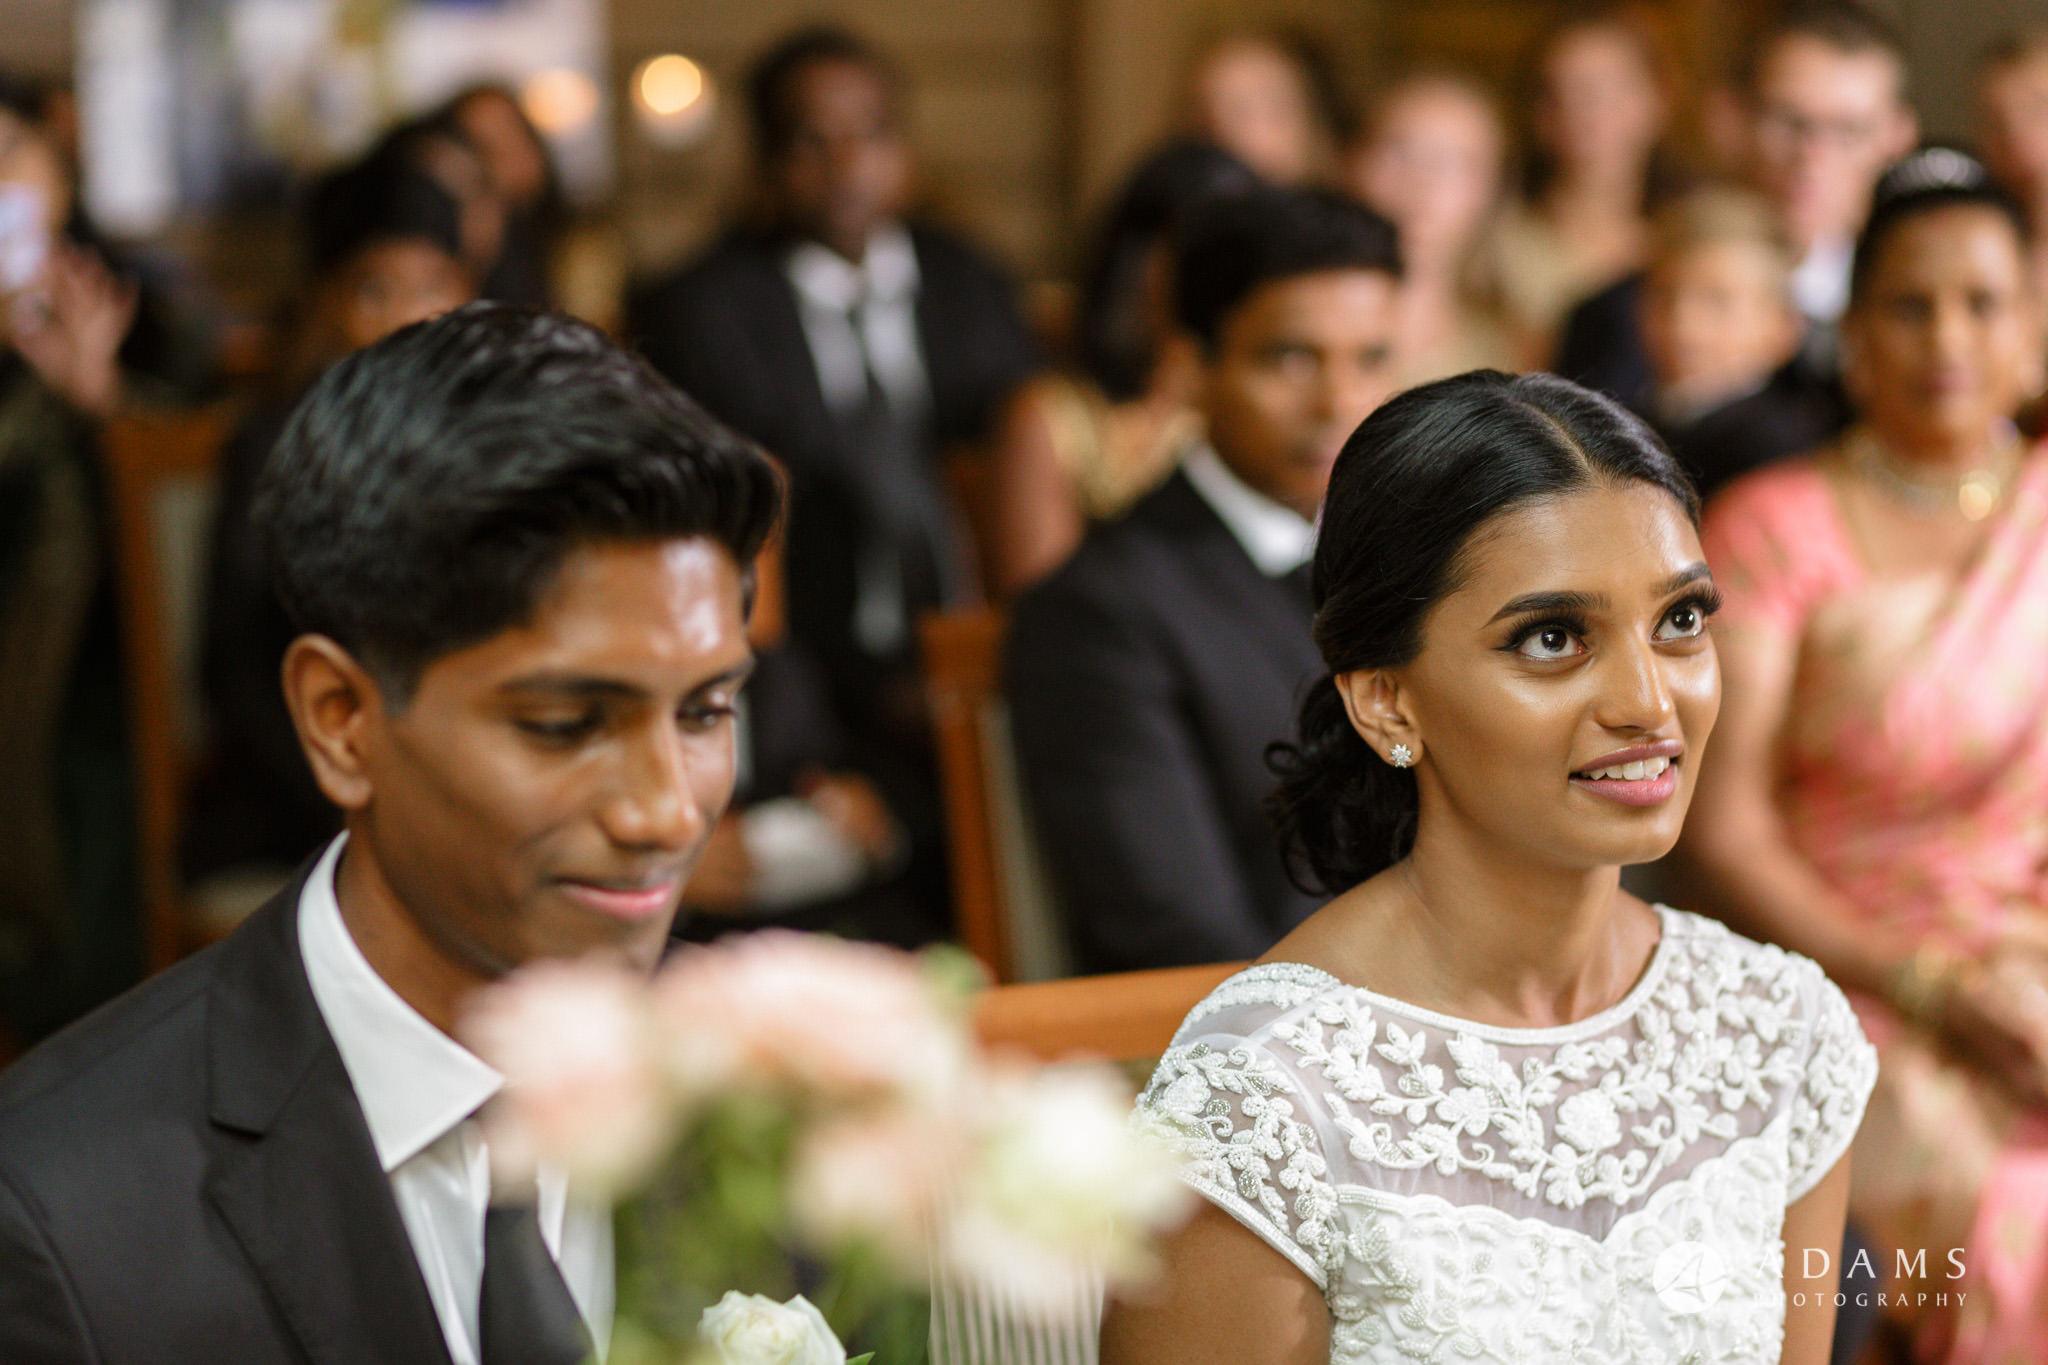 Oslo Wedding Photographer Norway couple sitting during the ceremony